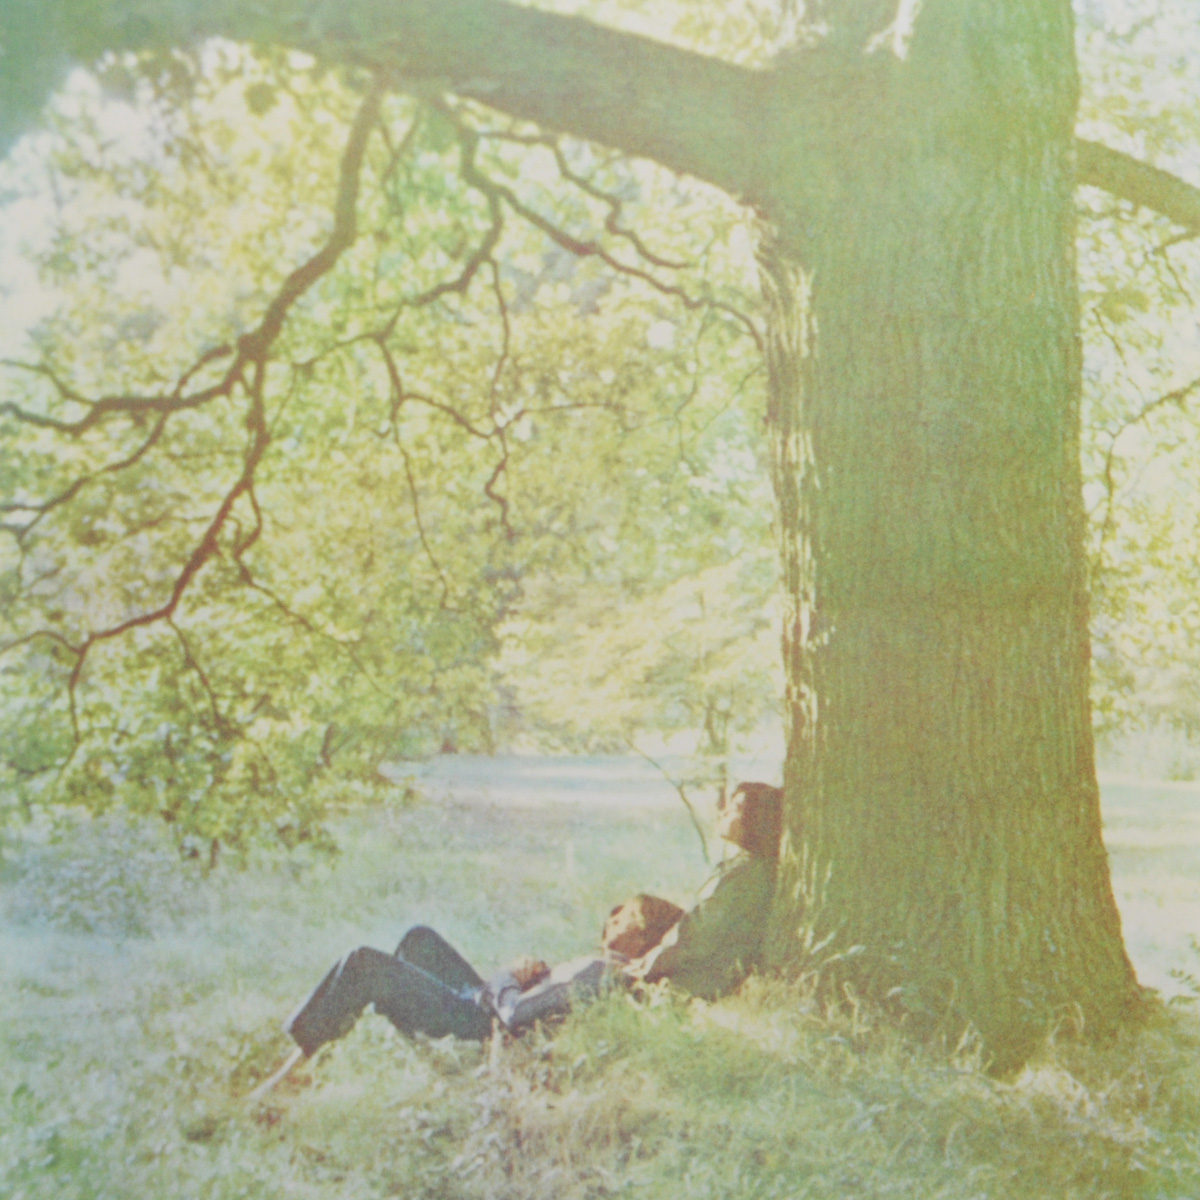 Джон Леннон John Lennon. Plastic Ono Band (LP) элтон джон elton john goodbye yellow brick road deluxe edition 2 cd